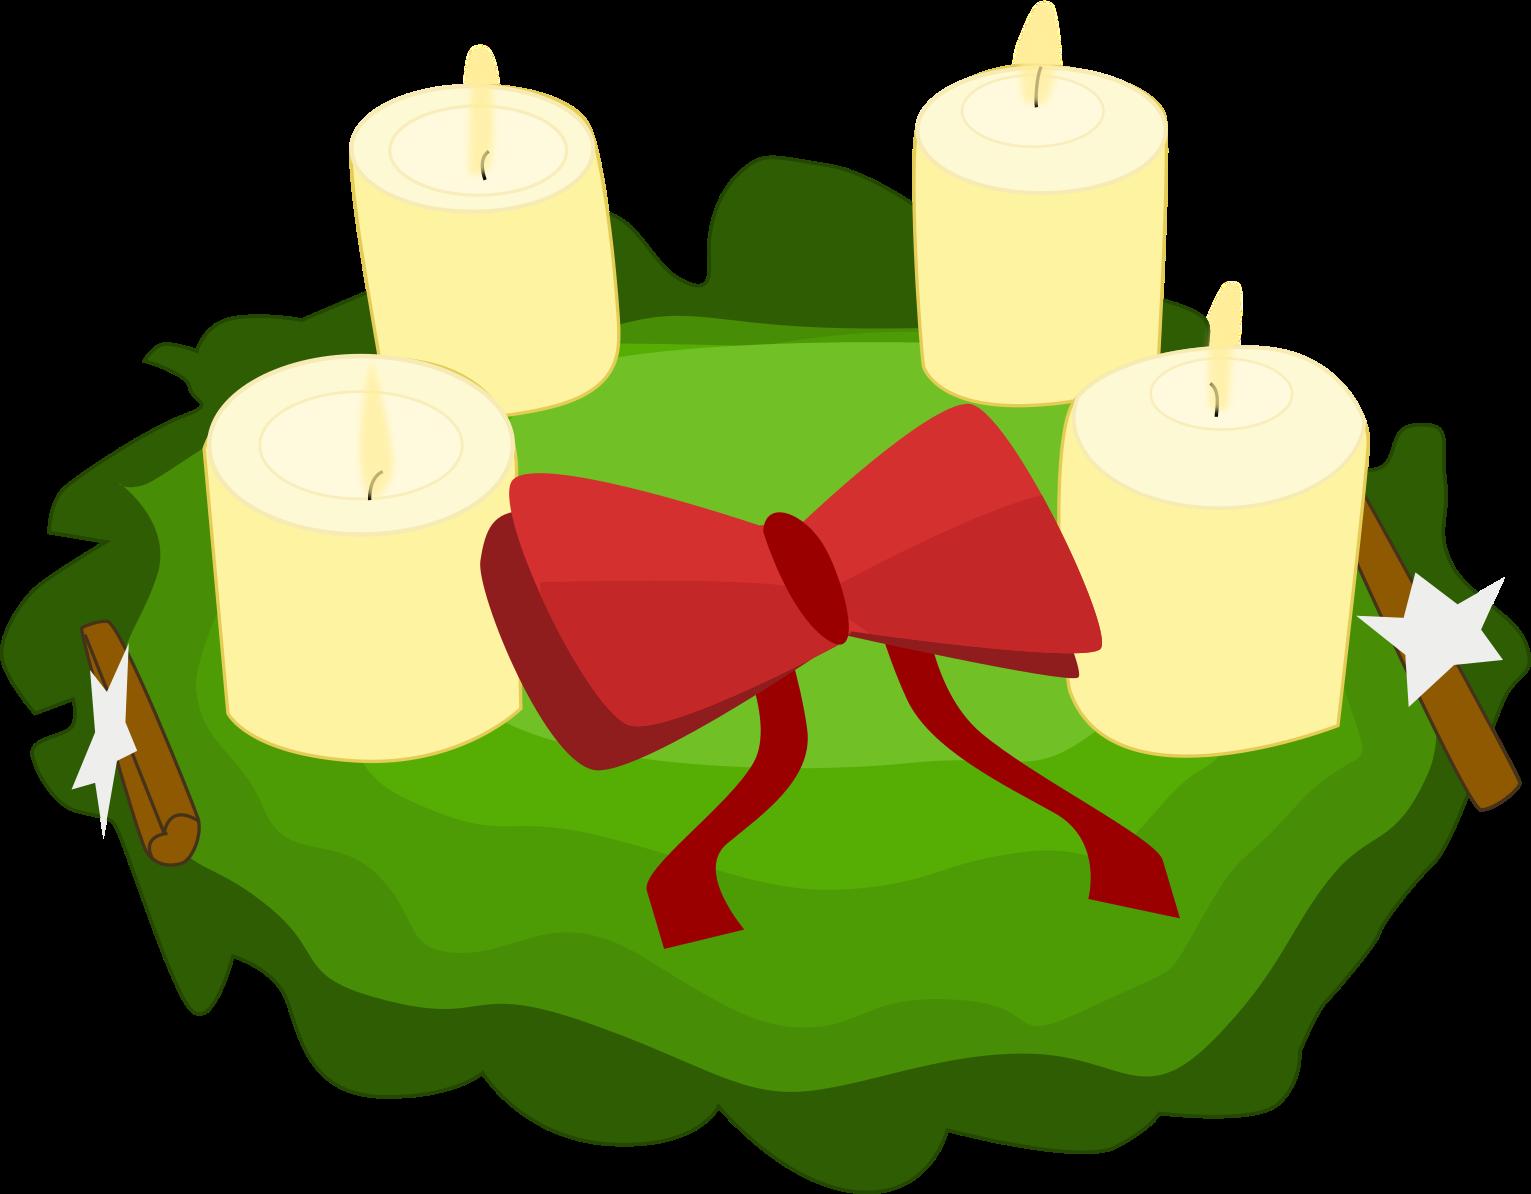 1531x1194 Free To Use Amp Public Domain Advent Wreath Clip Art